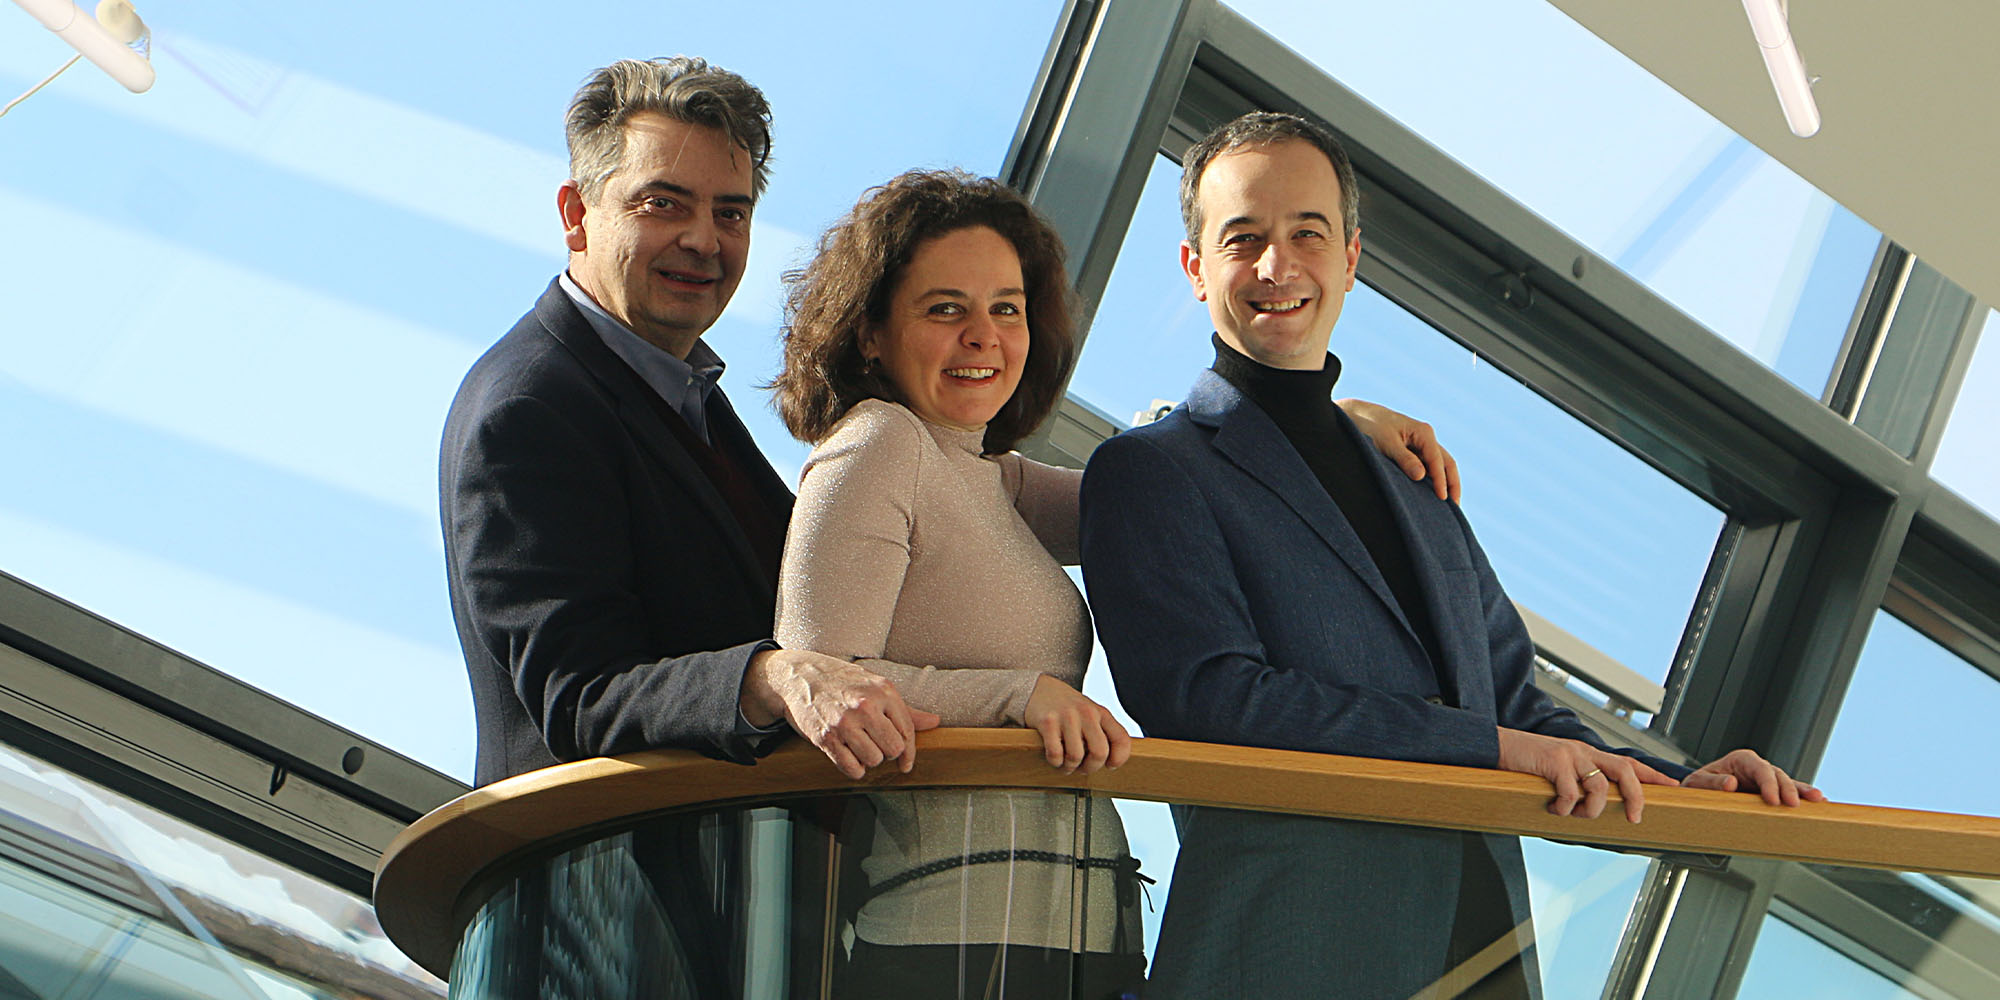 Christoph Wagner-Trenkwitz, Andrea Linsbauer, Adrian Eröd